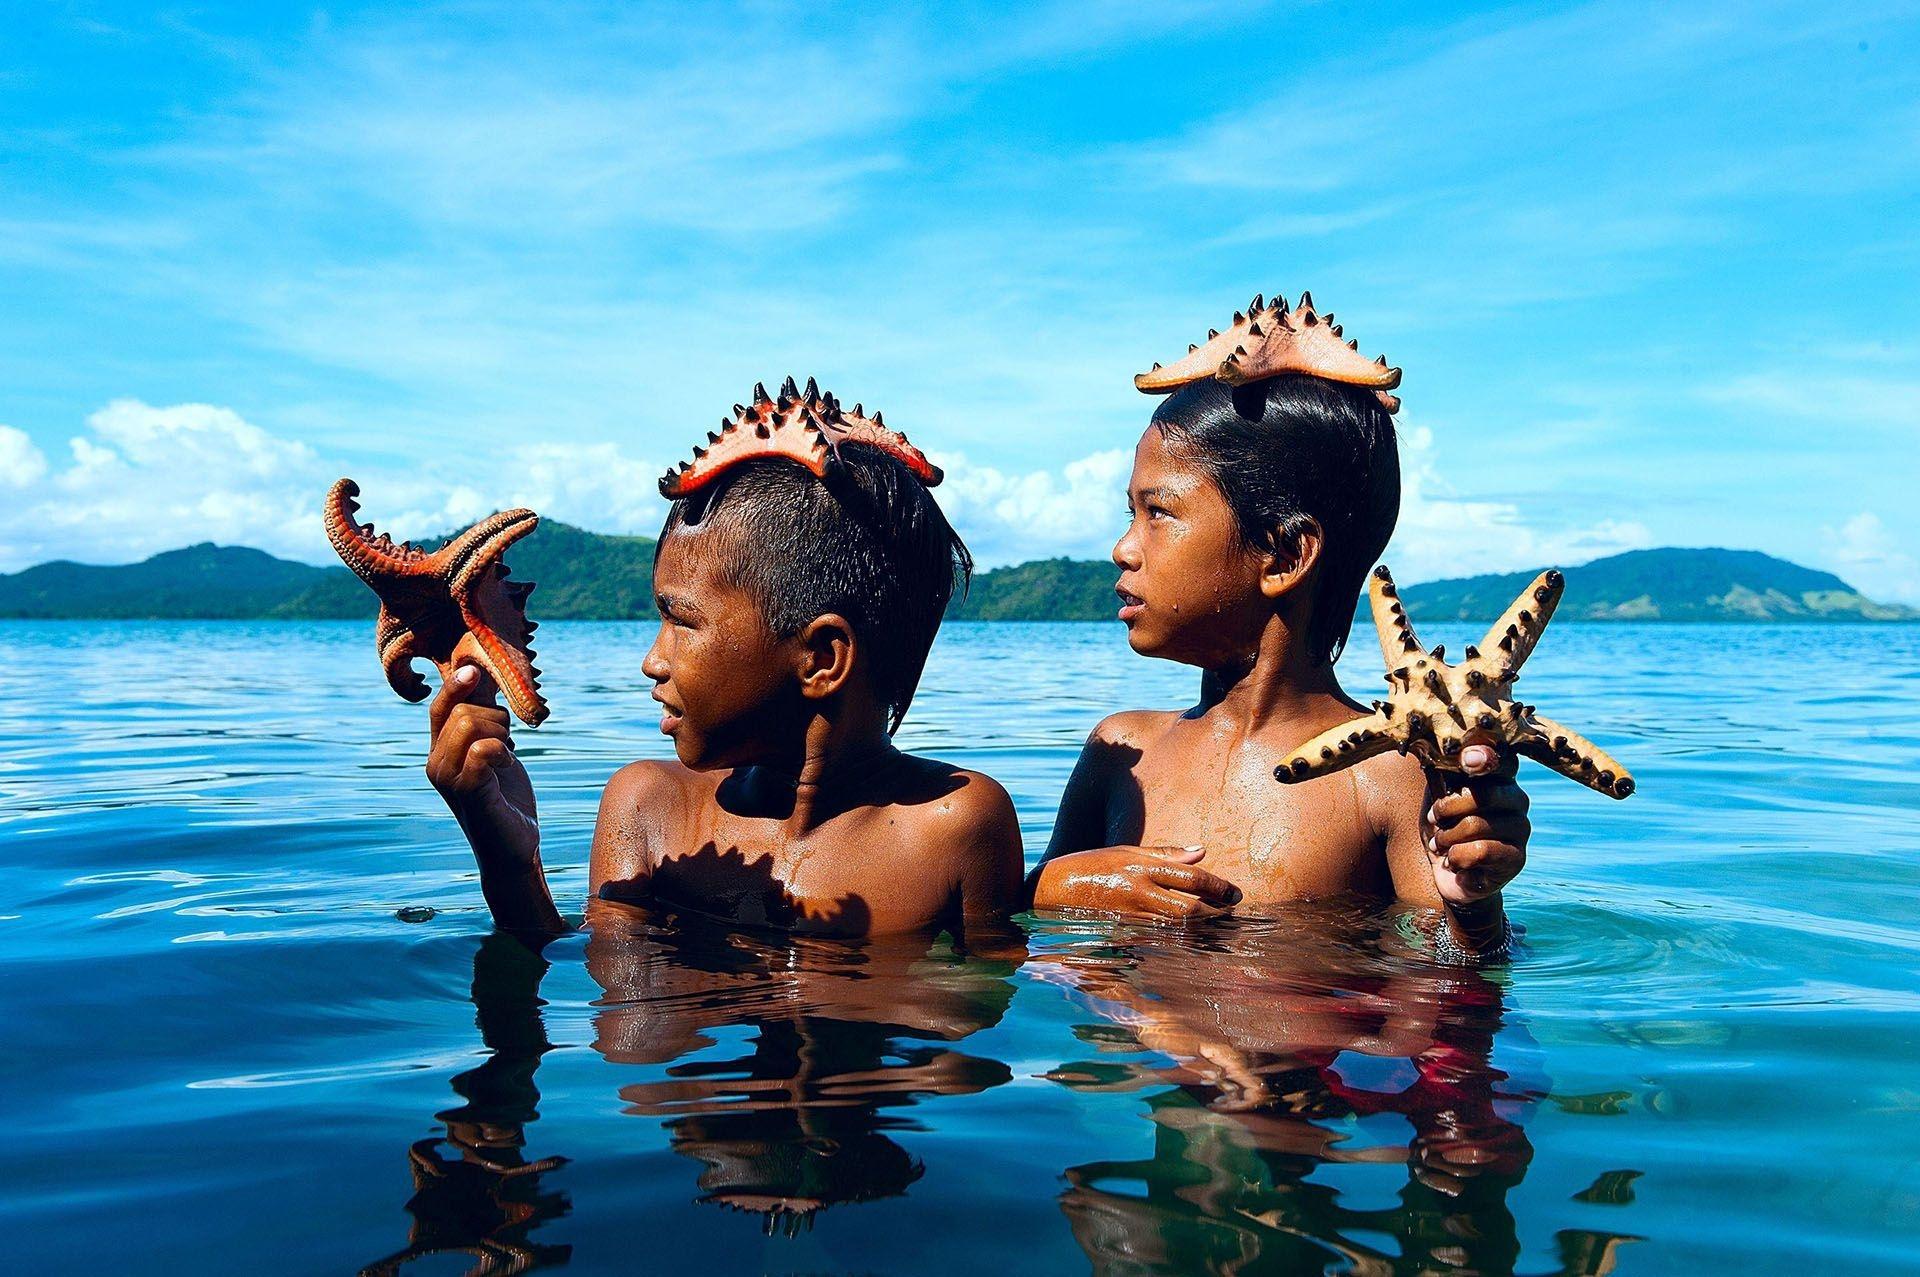 Photograph by yaman ibrahim , National Geographic